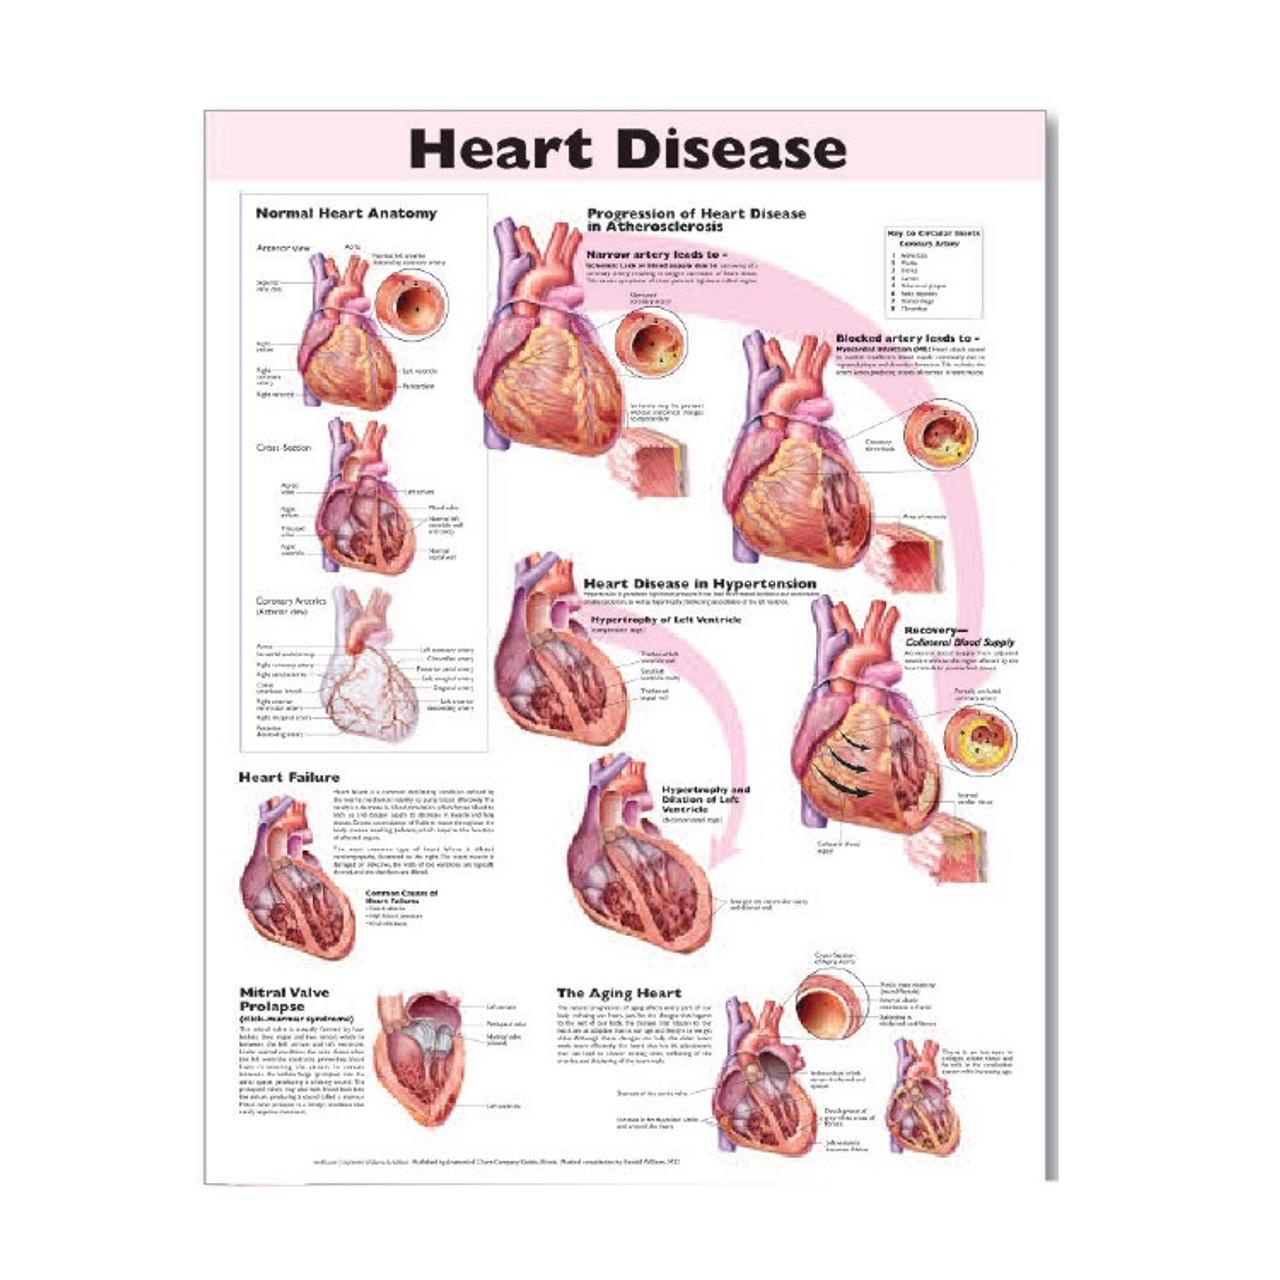 Heart Disease Anatomical Chart, 2nd Edition